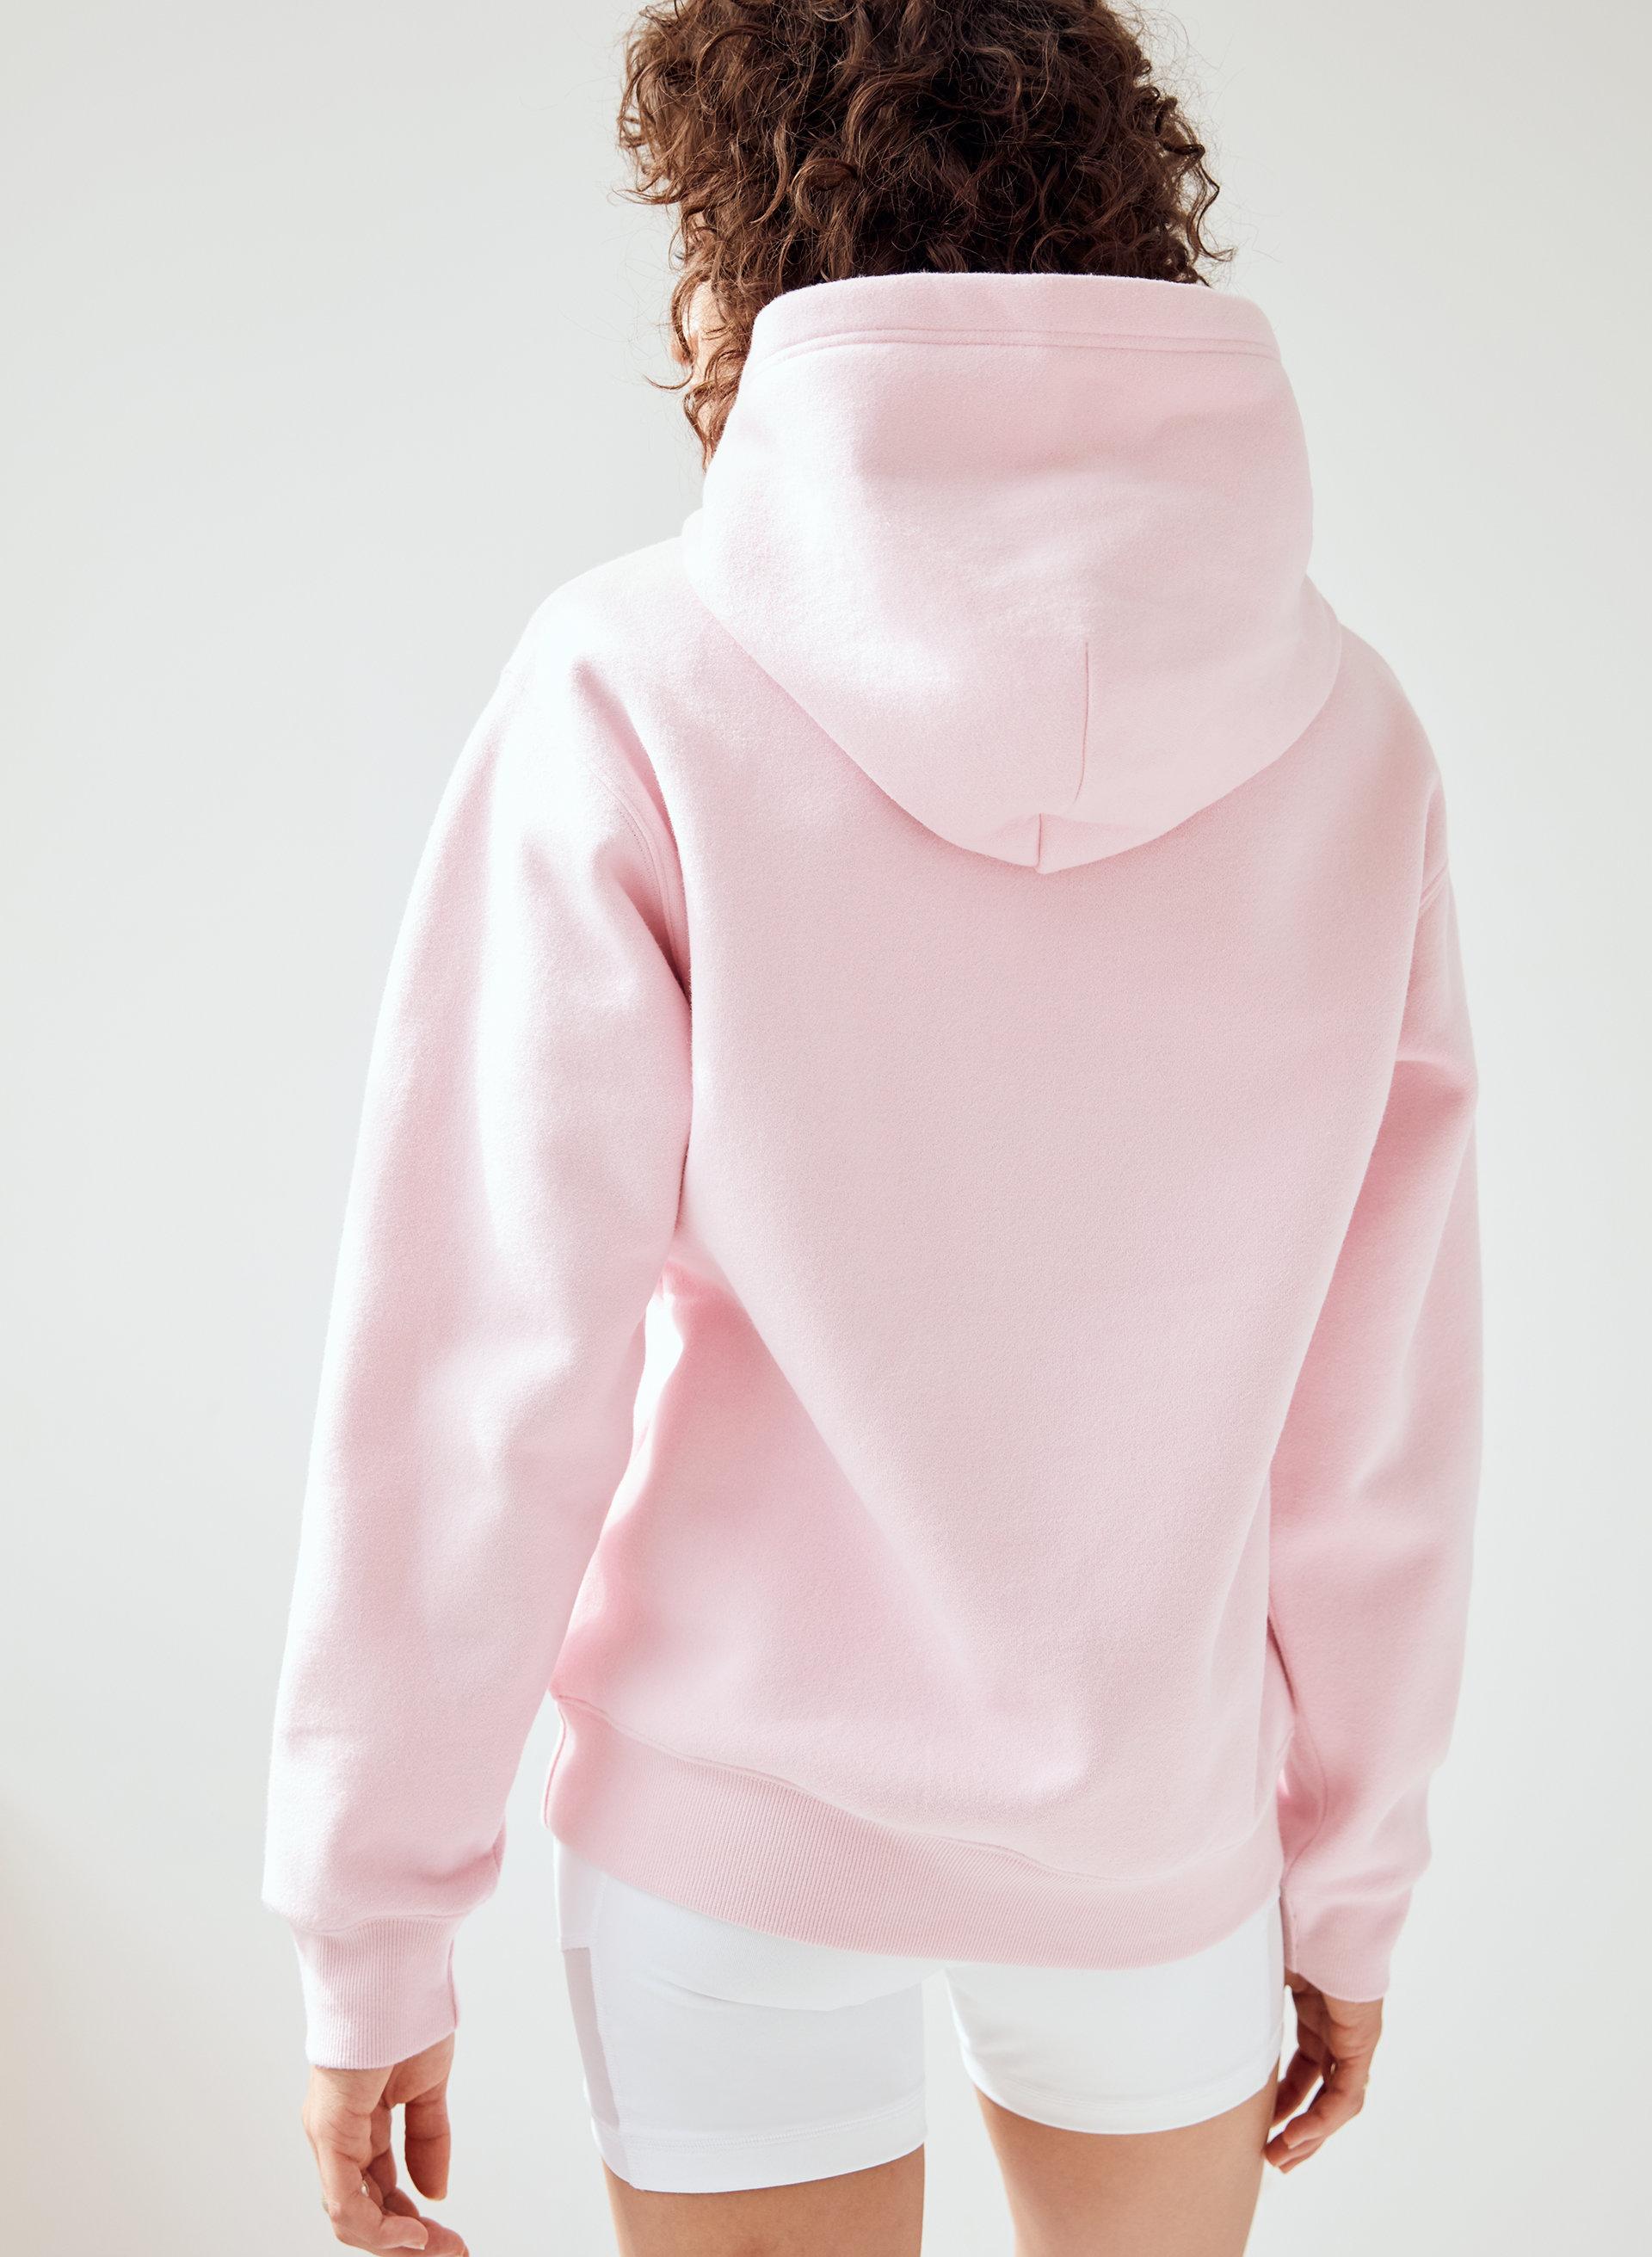 5199ec2f5 h and m nasa hoodie | Coupon code